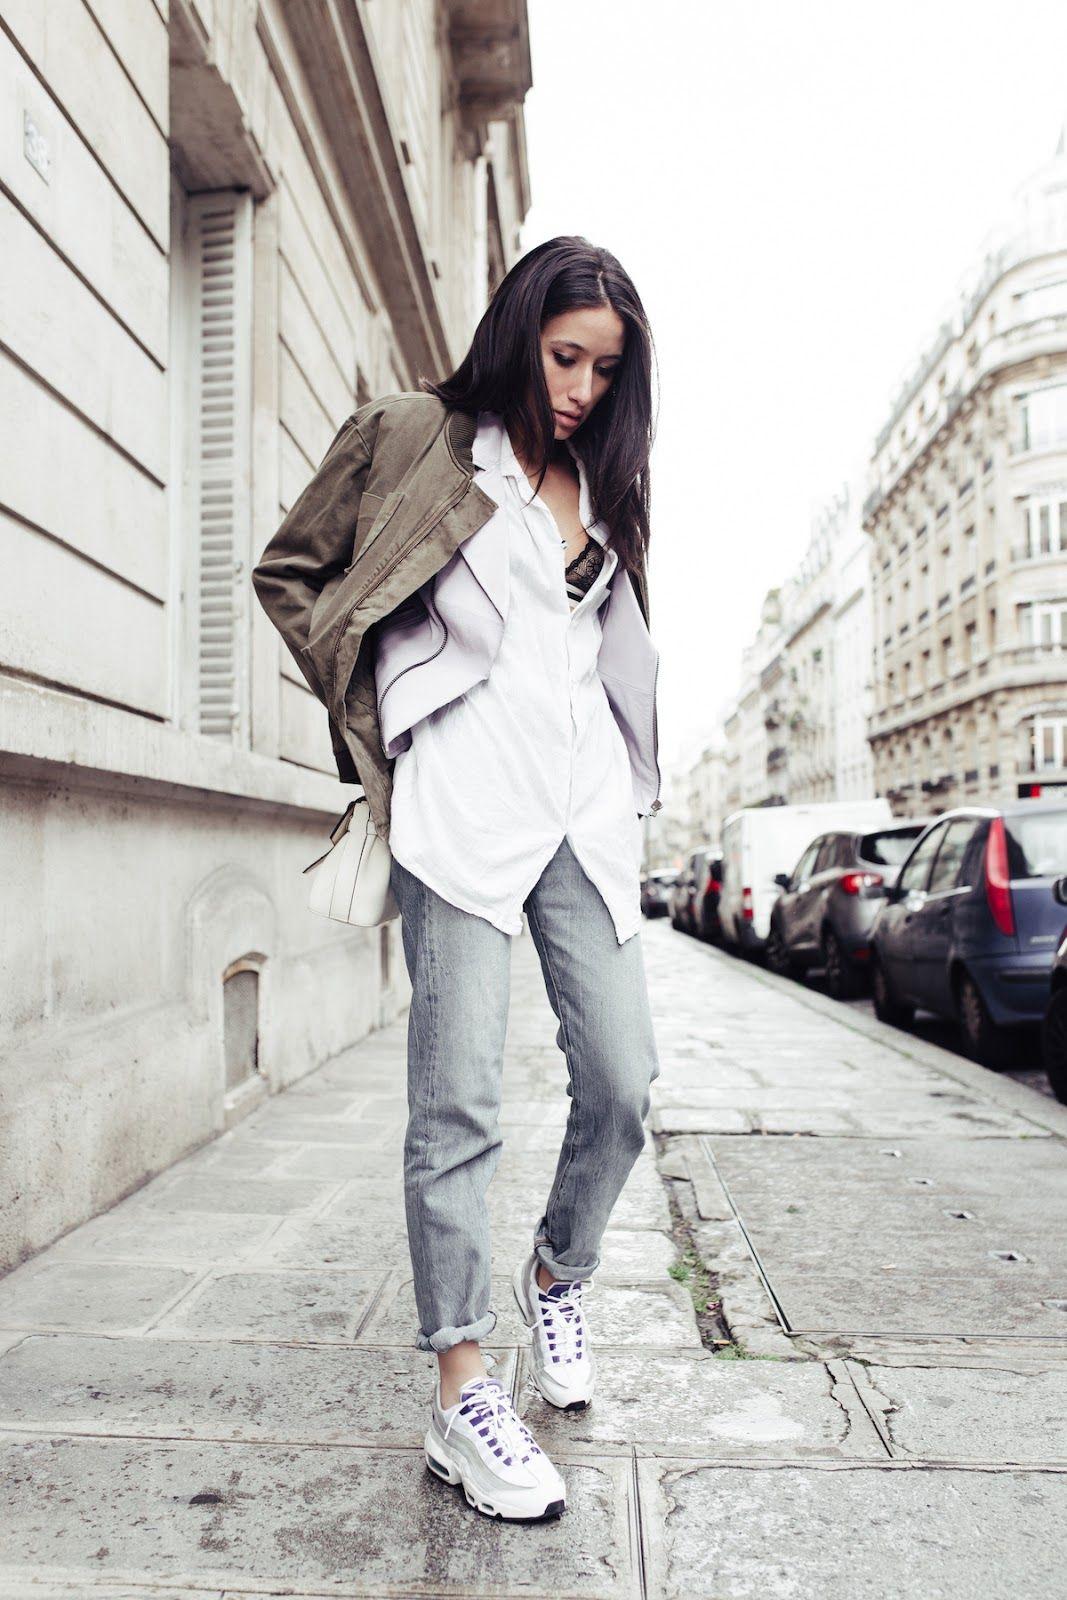 eee56074b9 Alex s Closet - Blog mode et voyage - Paris